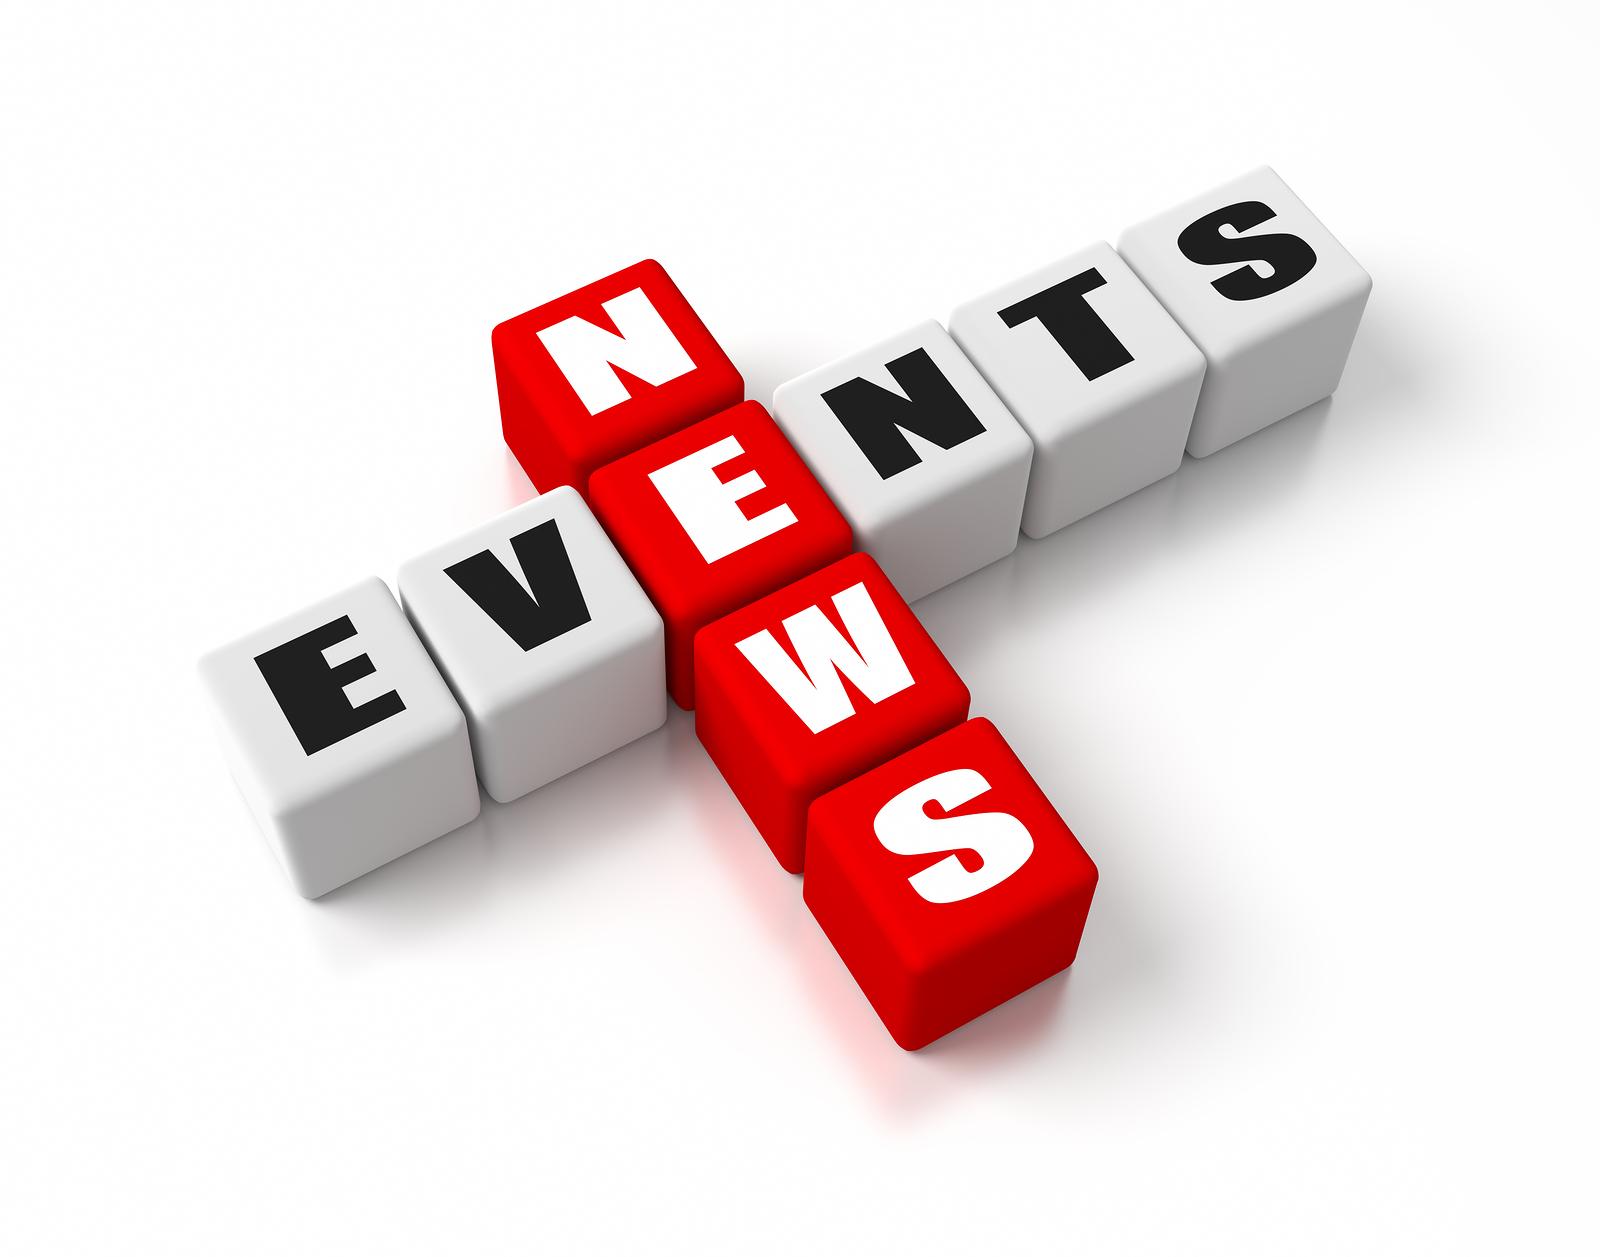 pmi_equipment_news_events